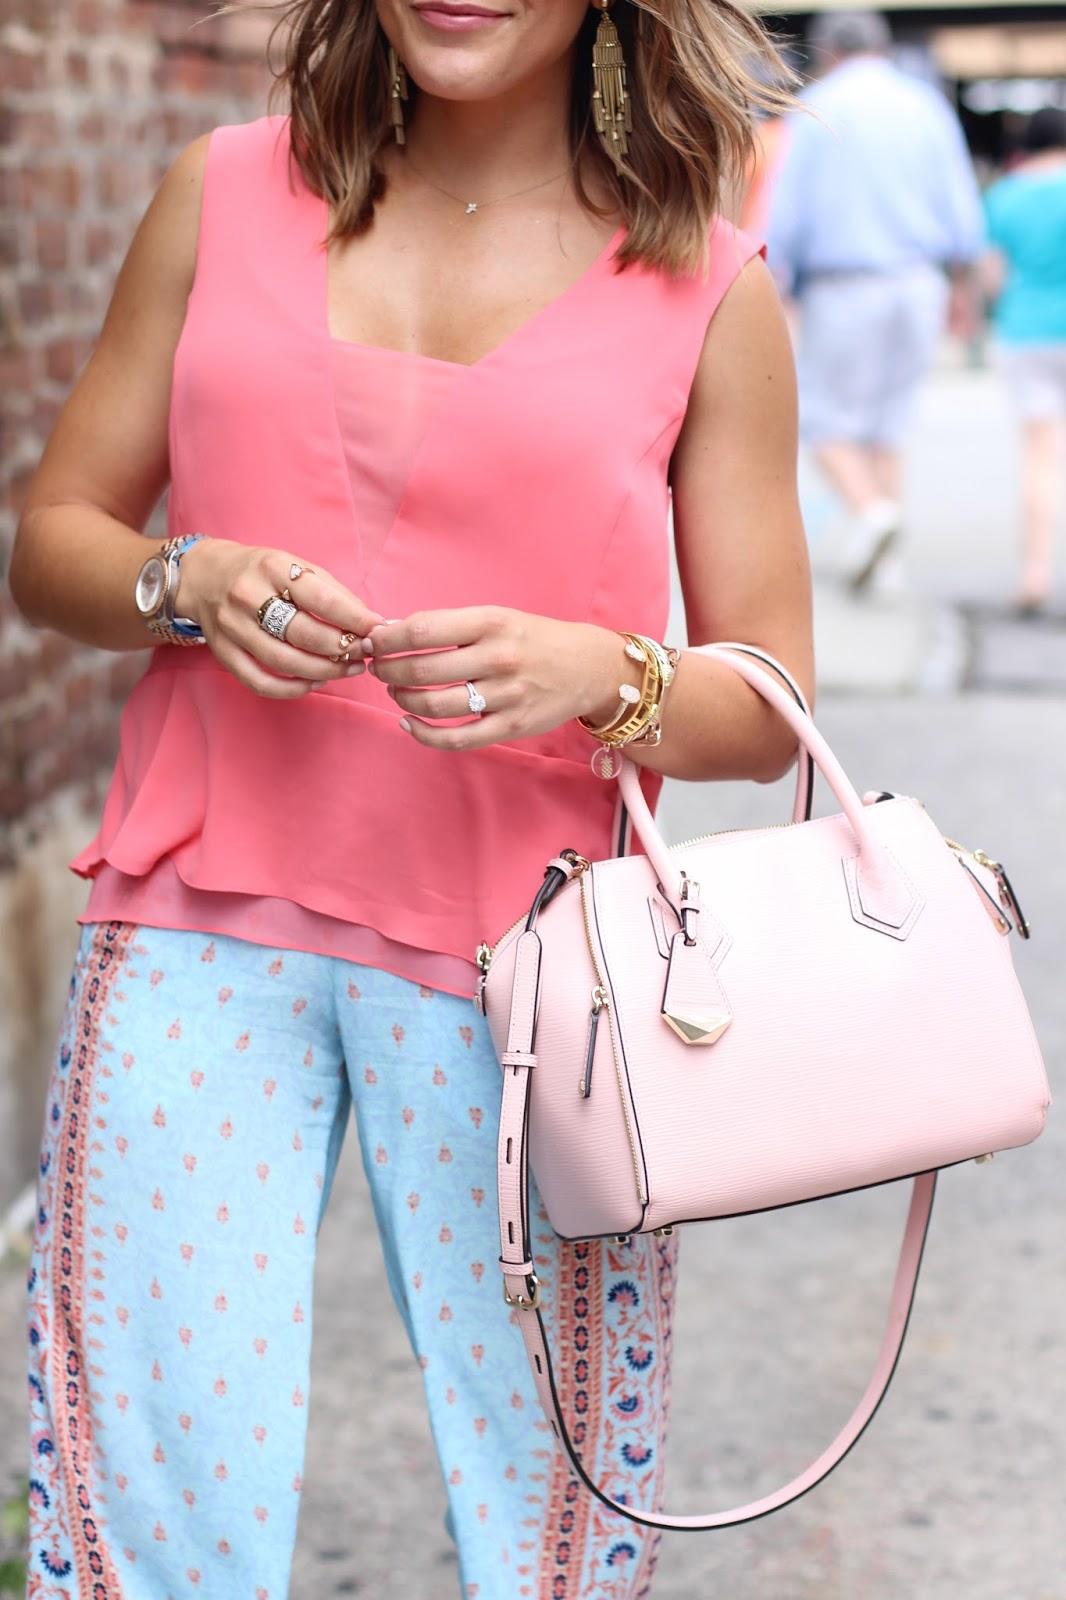 Shelby Skaggs from Glitter & Gingham: BCBGMAXAZRIA top & pants, Rebecca Minkoff Bag